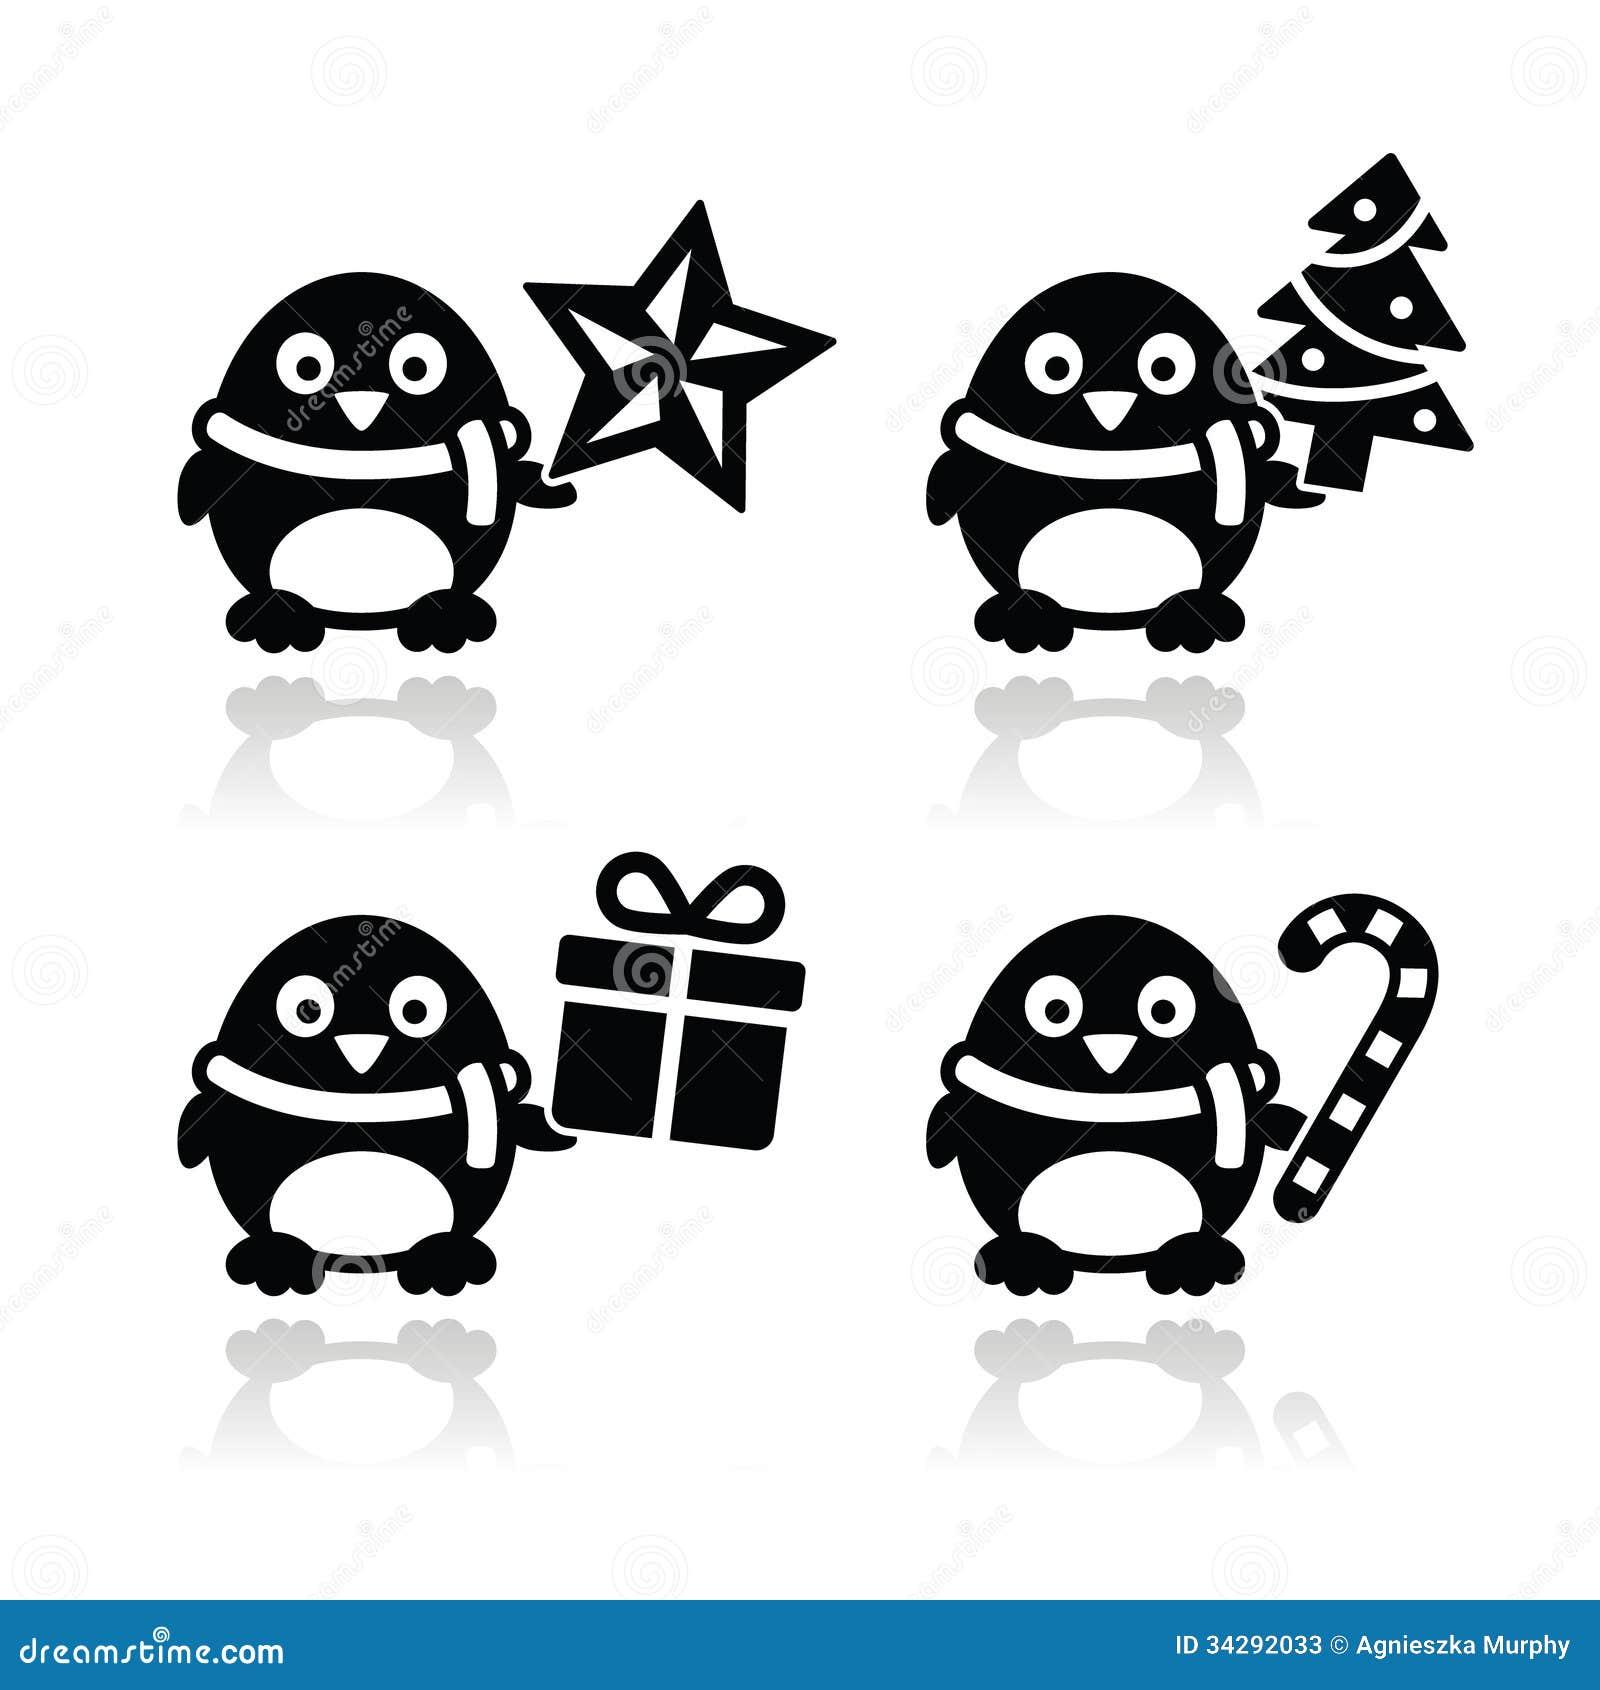 Elegant christmas tree decor - Christmas Cute Penguin Icons Set Stock Photos Image